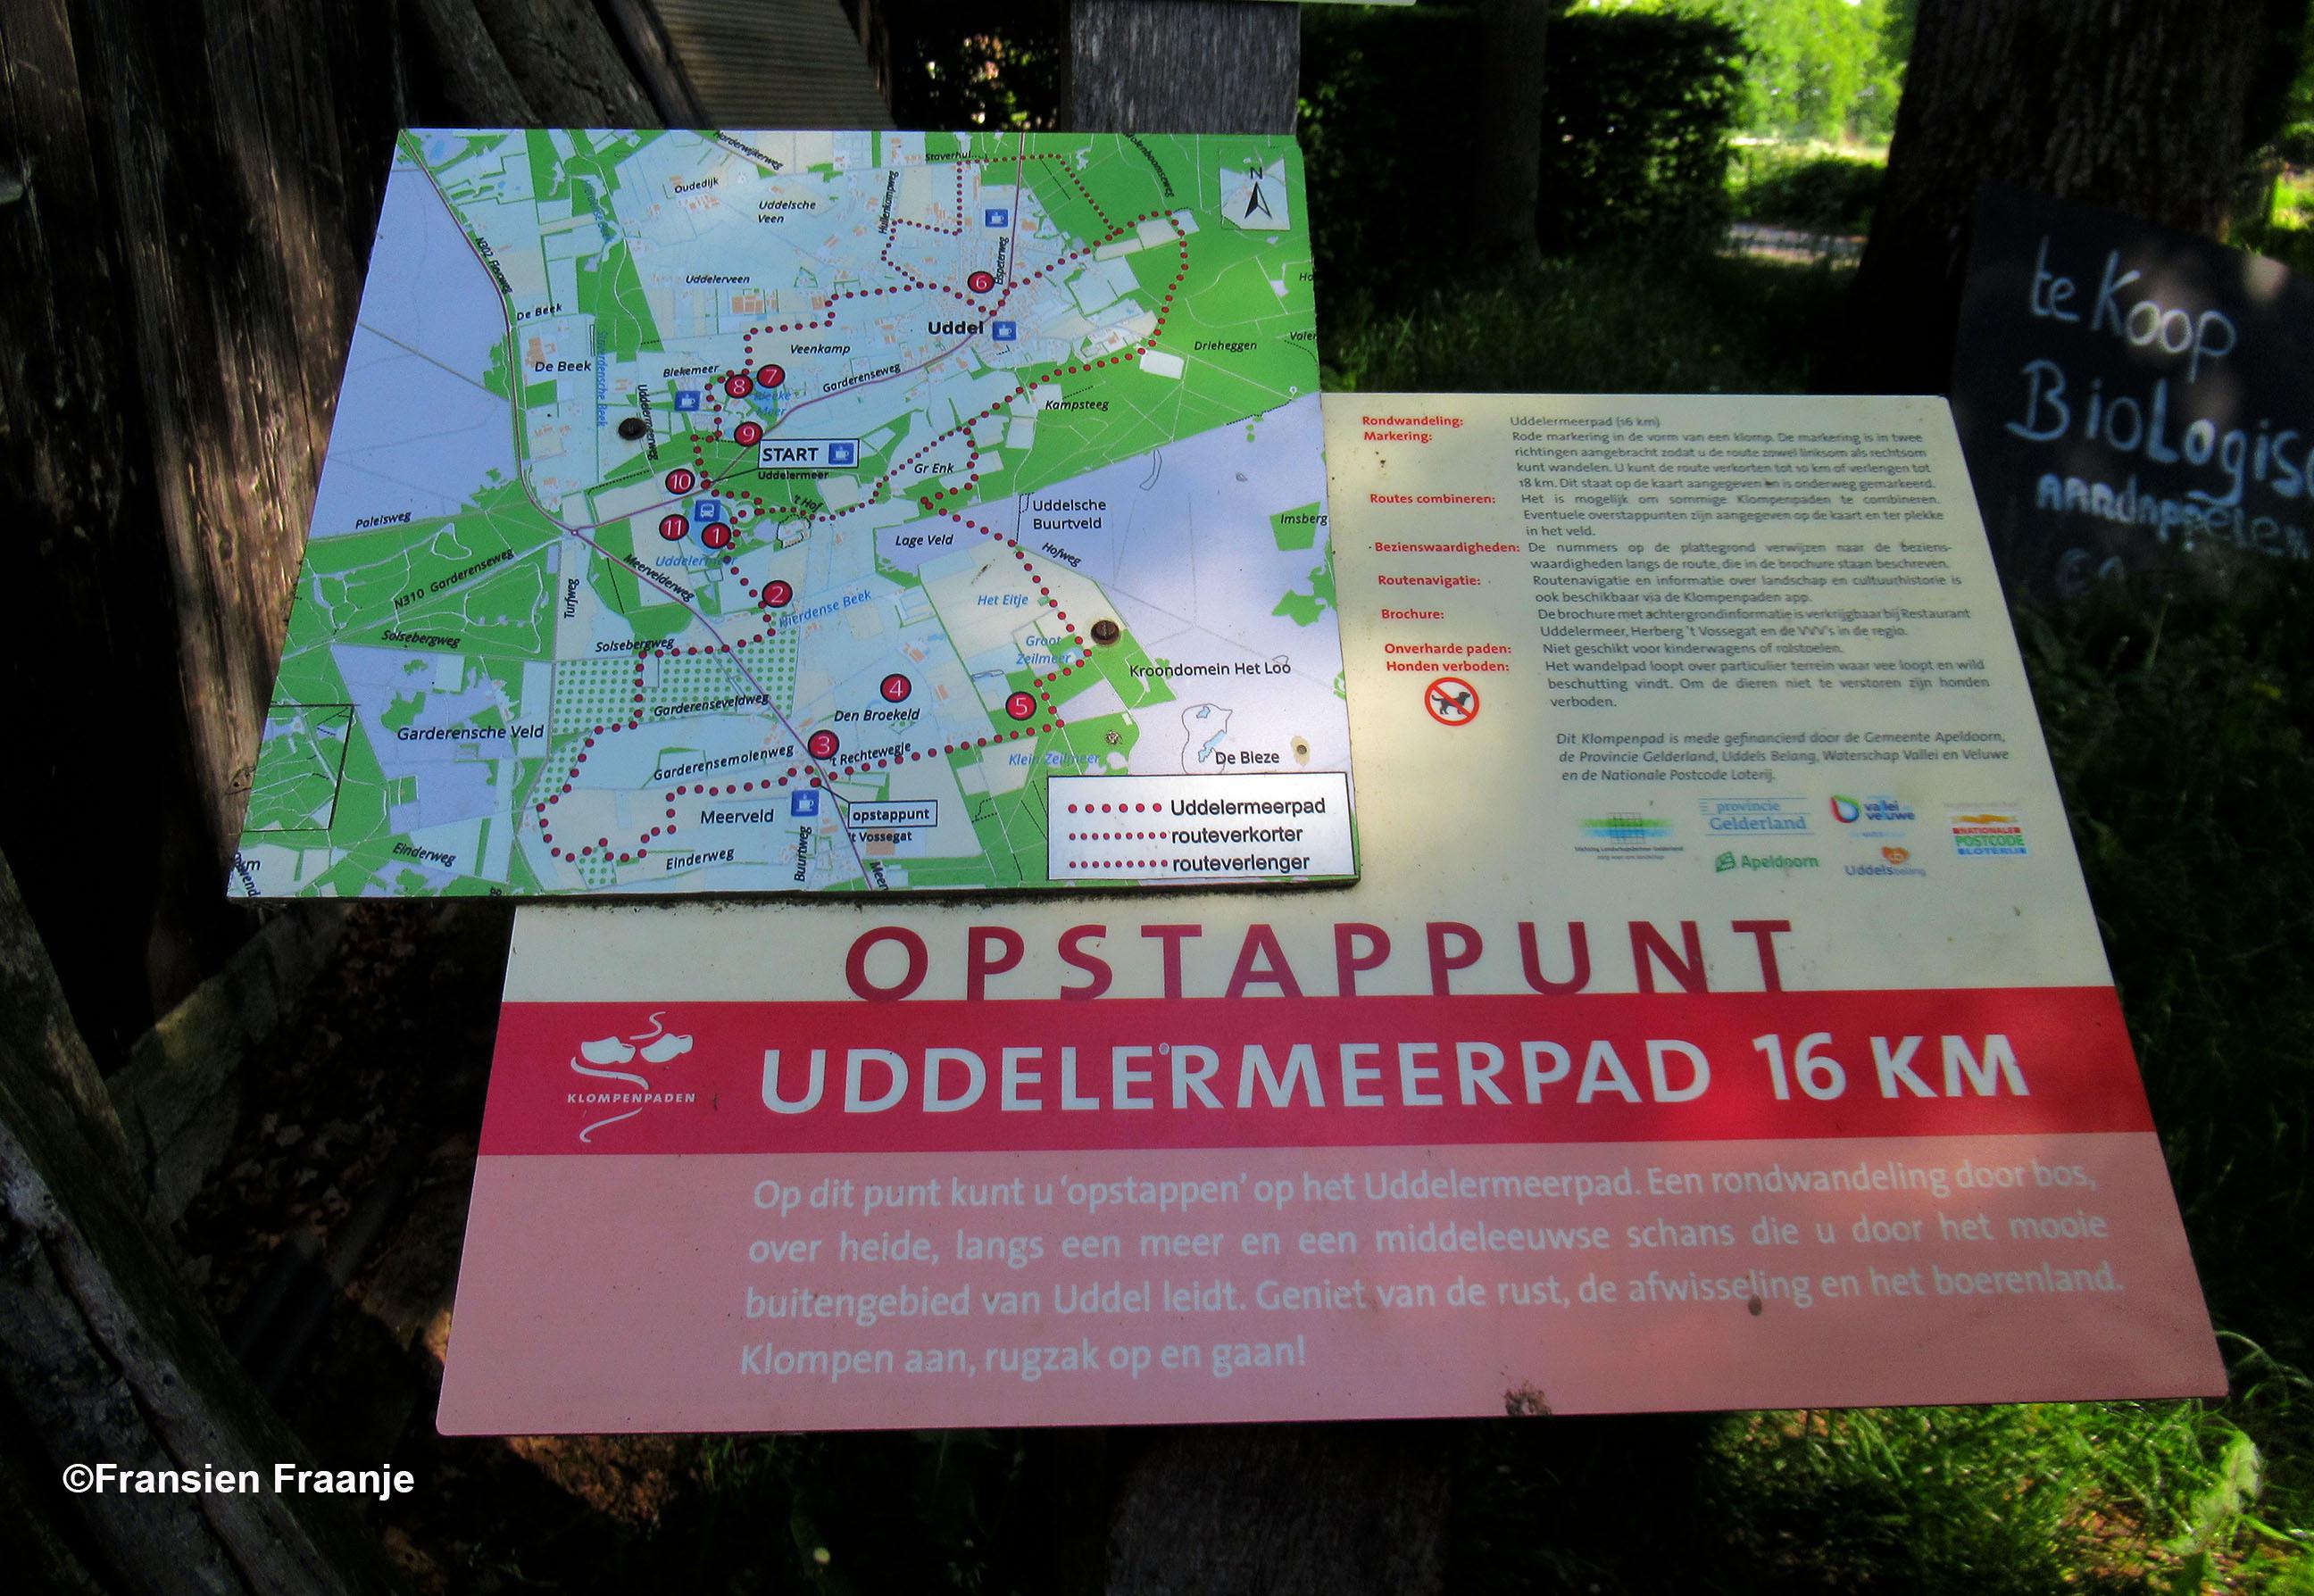 Opstappunt van het Uddelermeerpad met een lengte van van 16 kilometer - Foto: ©Fransien Fraanje